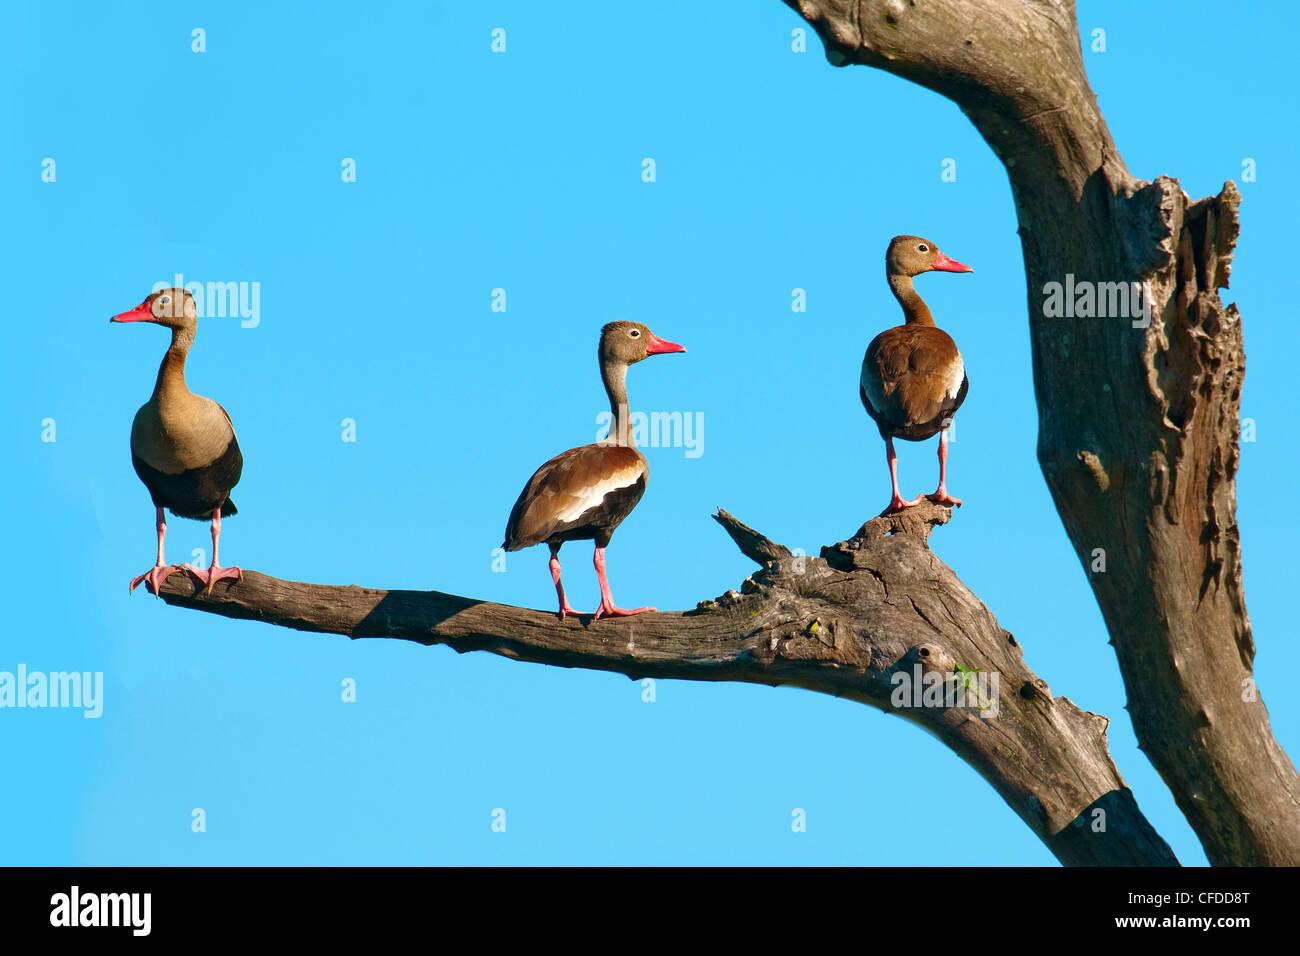 Black-bellied whistling ducks (Dendrocygna autumnalis), Pantanal wetlands, Southwestern Brazil, South America - Stock Image